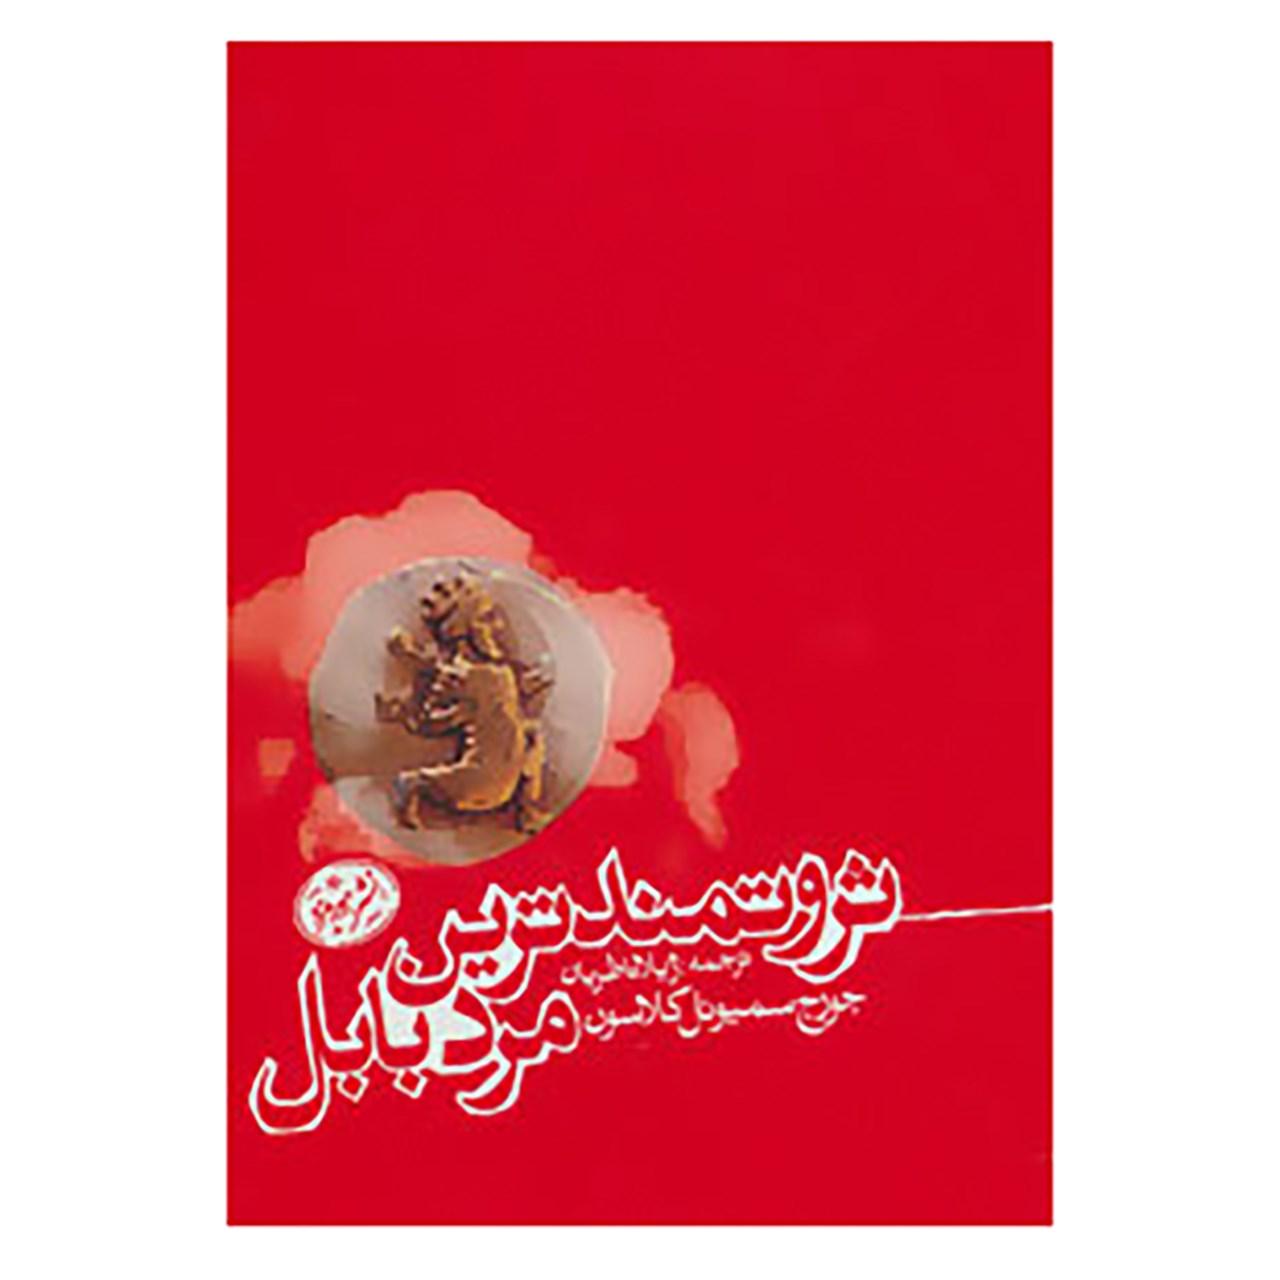 خرید                      کتاب ثروتمندترین مرد بابل اثر جورج سیموئل کلاسون